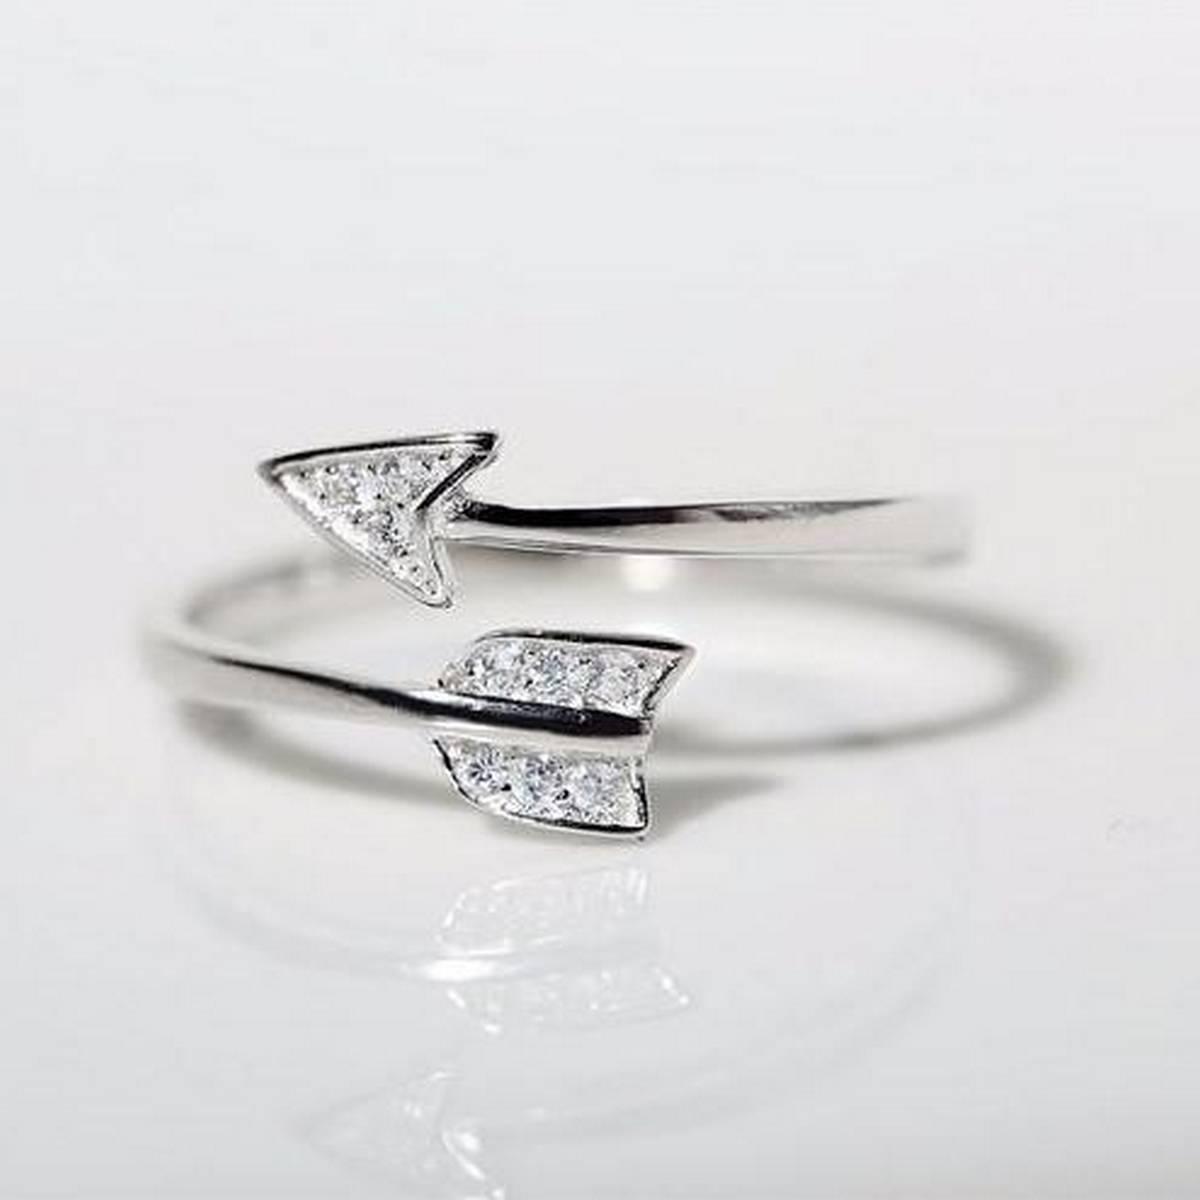 Ladies Arrow Crystal Adjustable Ring Jewellery Gift Engagement Ring